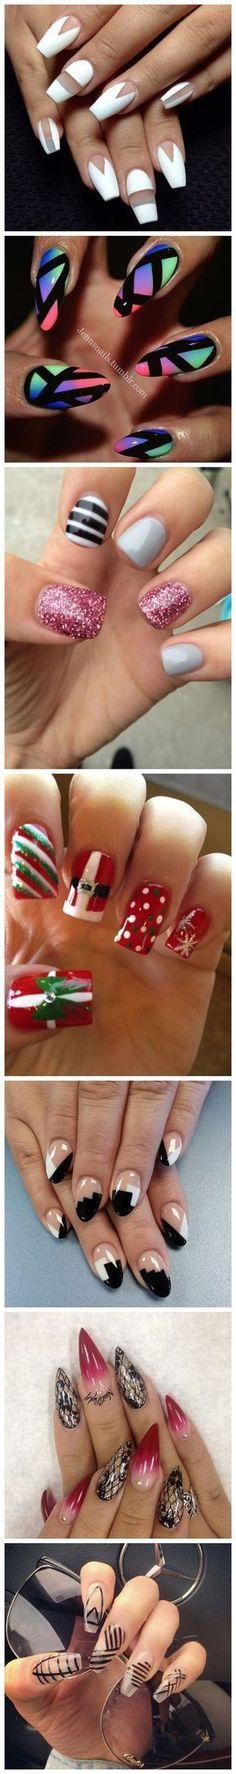 7 Cute & Easy Fall Nail Art Designs, Ideas, Trends & Stickers 2015 - Fashion Te